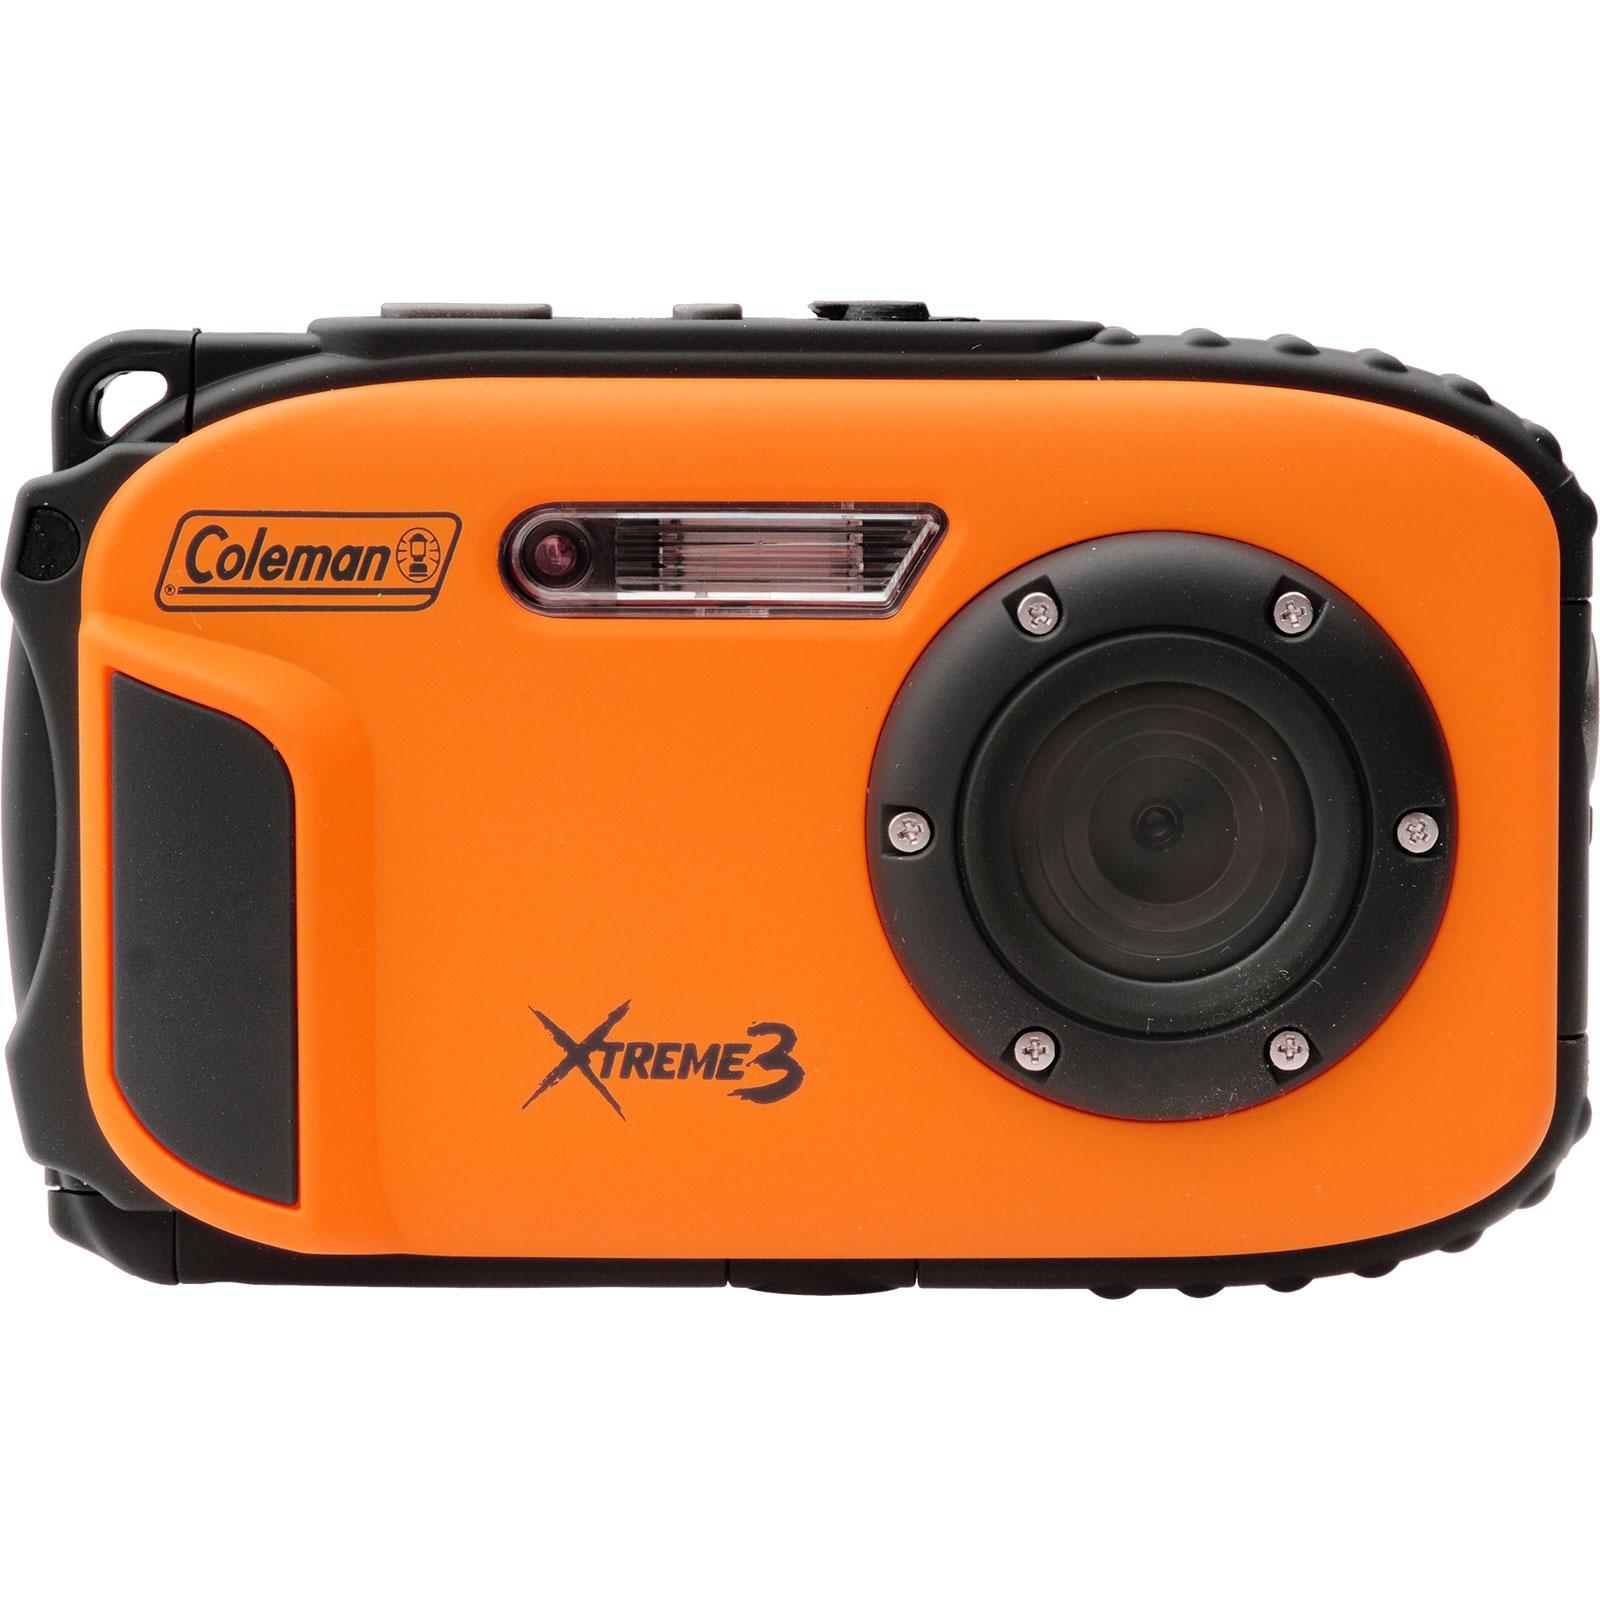 Coleman Xtreme3 C9WP Shock & Waterproof 1080p HD Digital Camera (Orange)